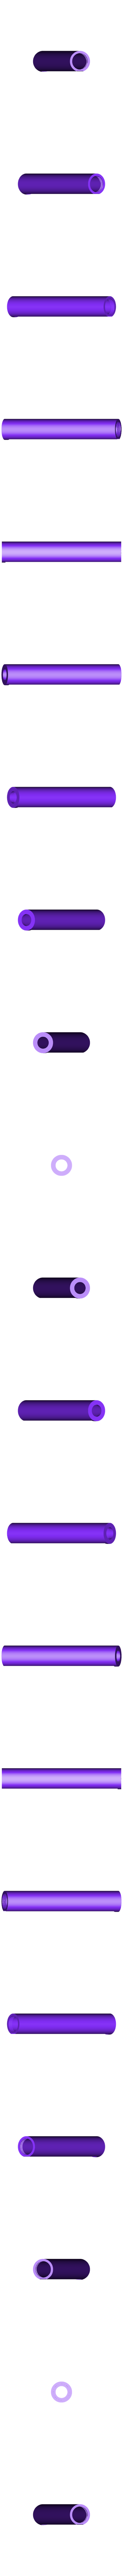 Led_powerbank.stl Download free STL file Portable Ambient Light LED Powerbank • 3D printer template, vmi